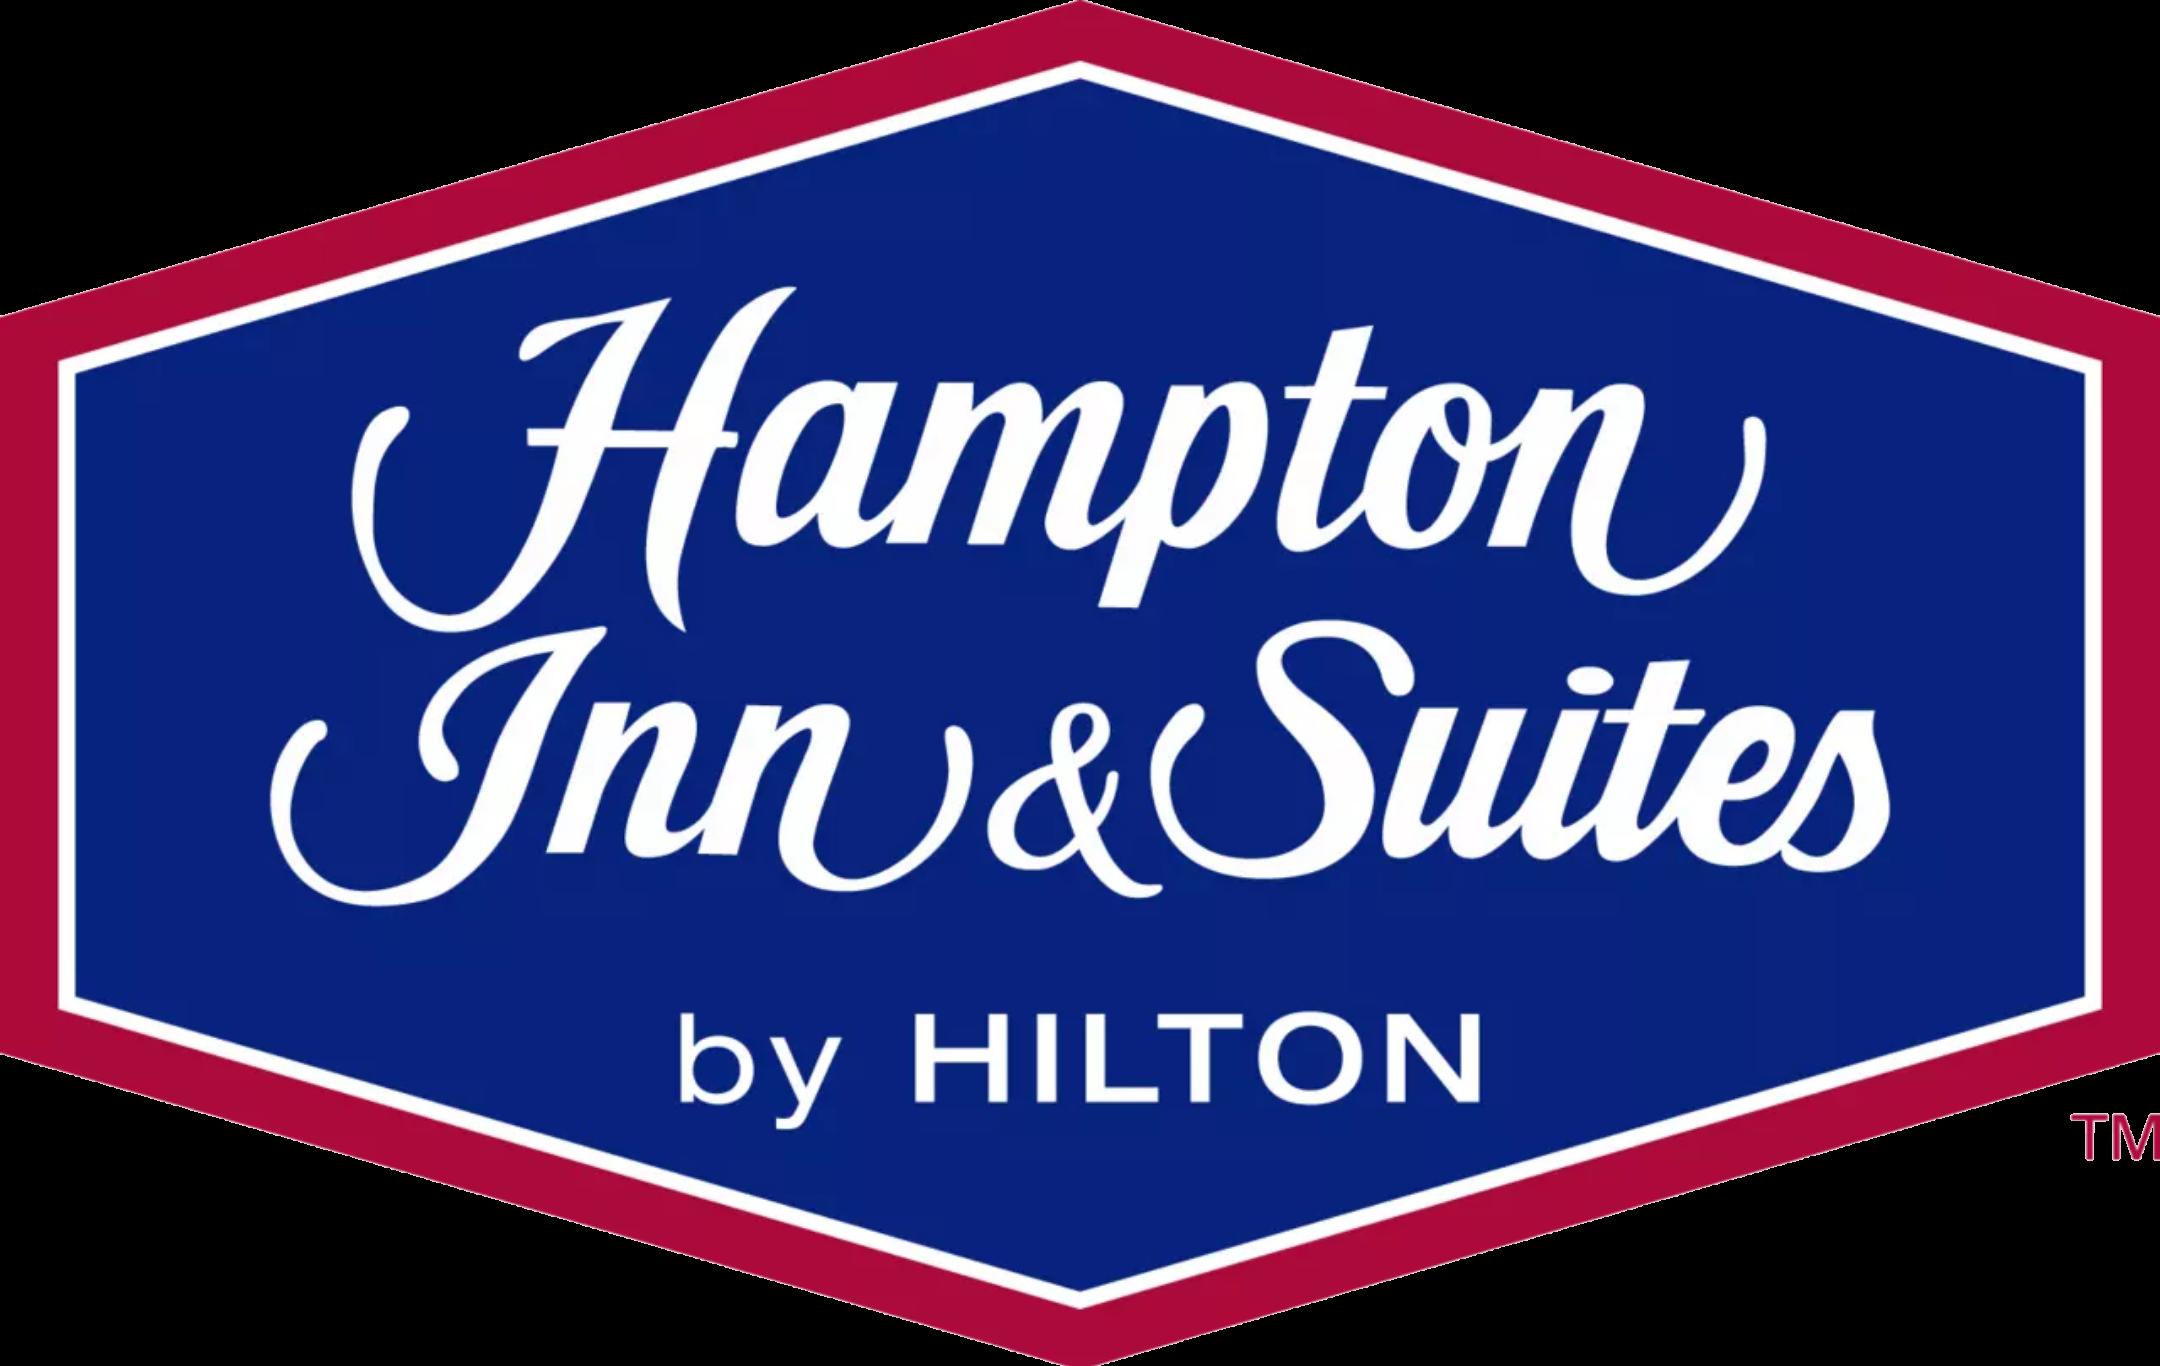 hampton inn and suites beechwood hospitality.png